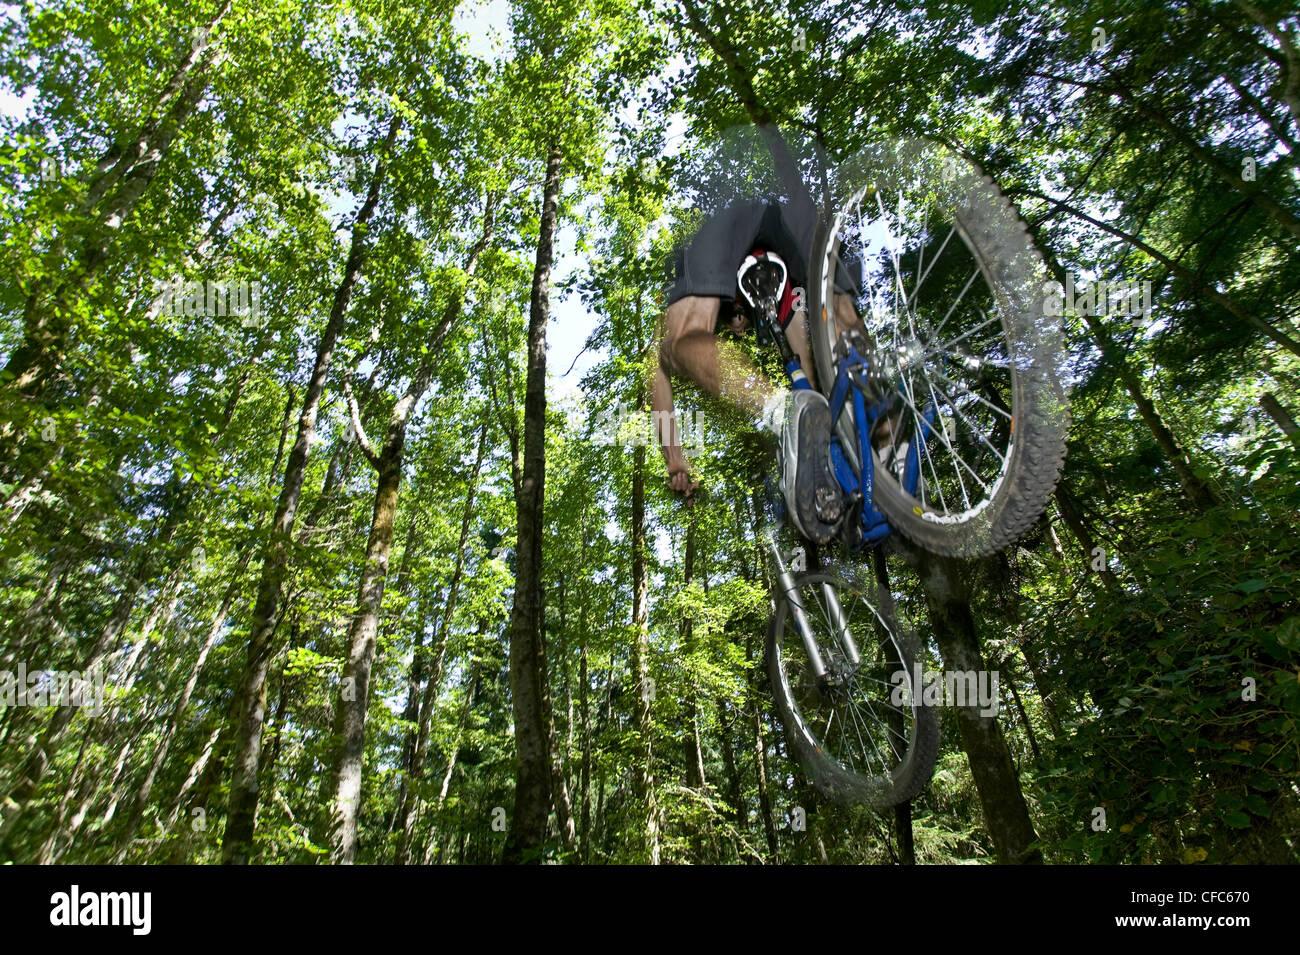 mountain biker photographed during jump - Stock Image